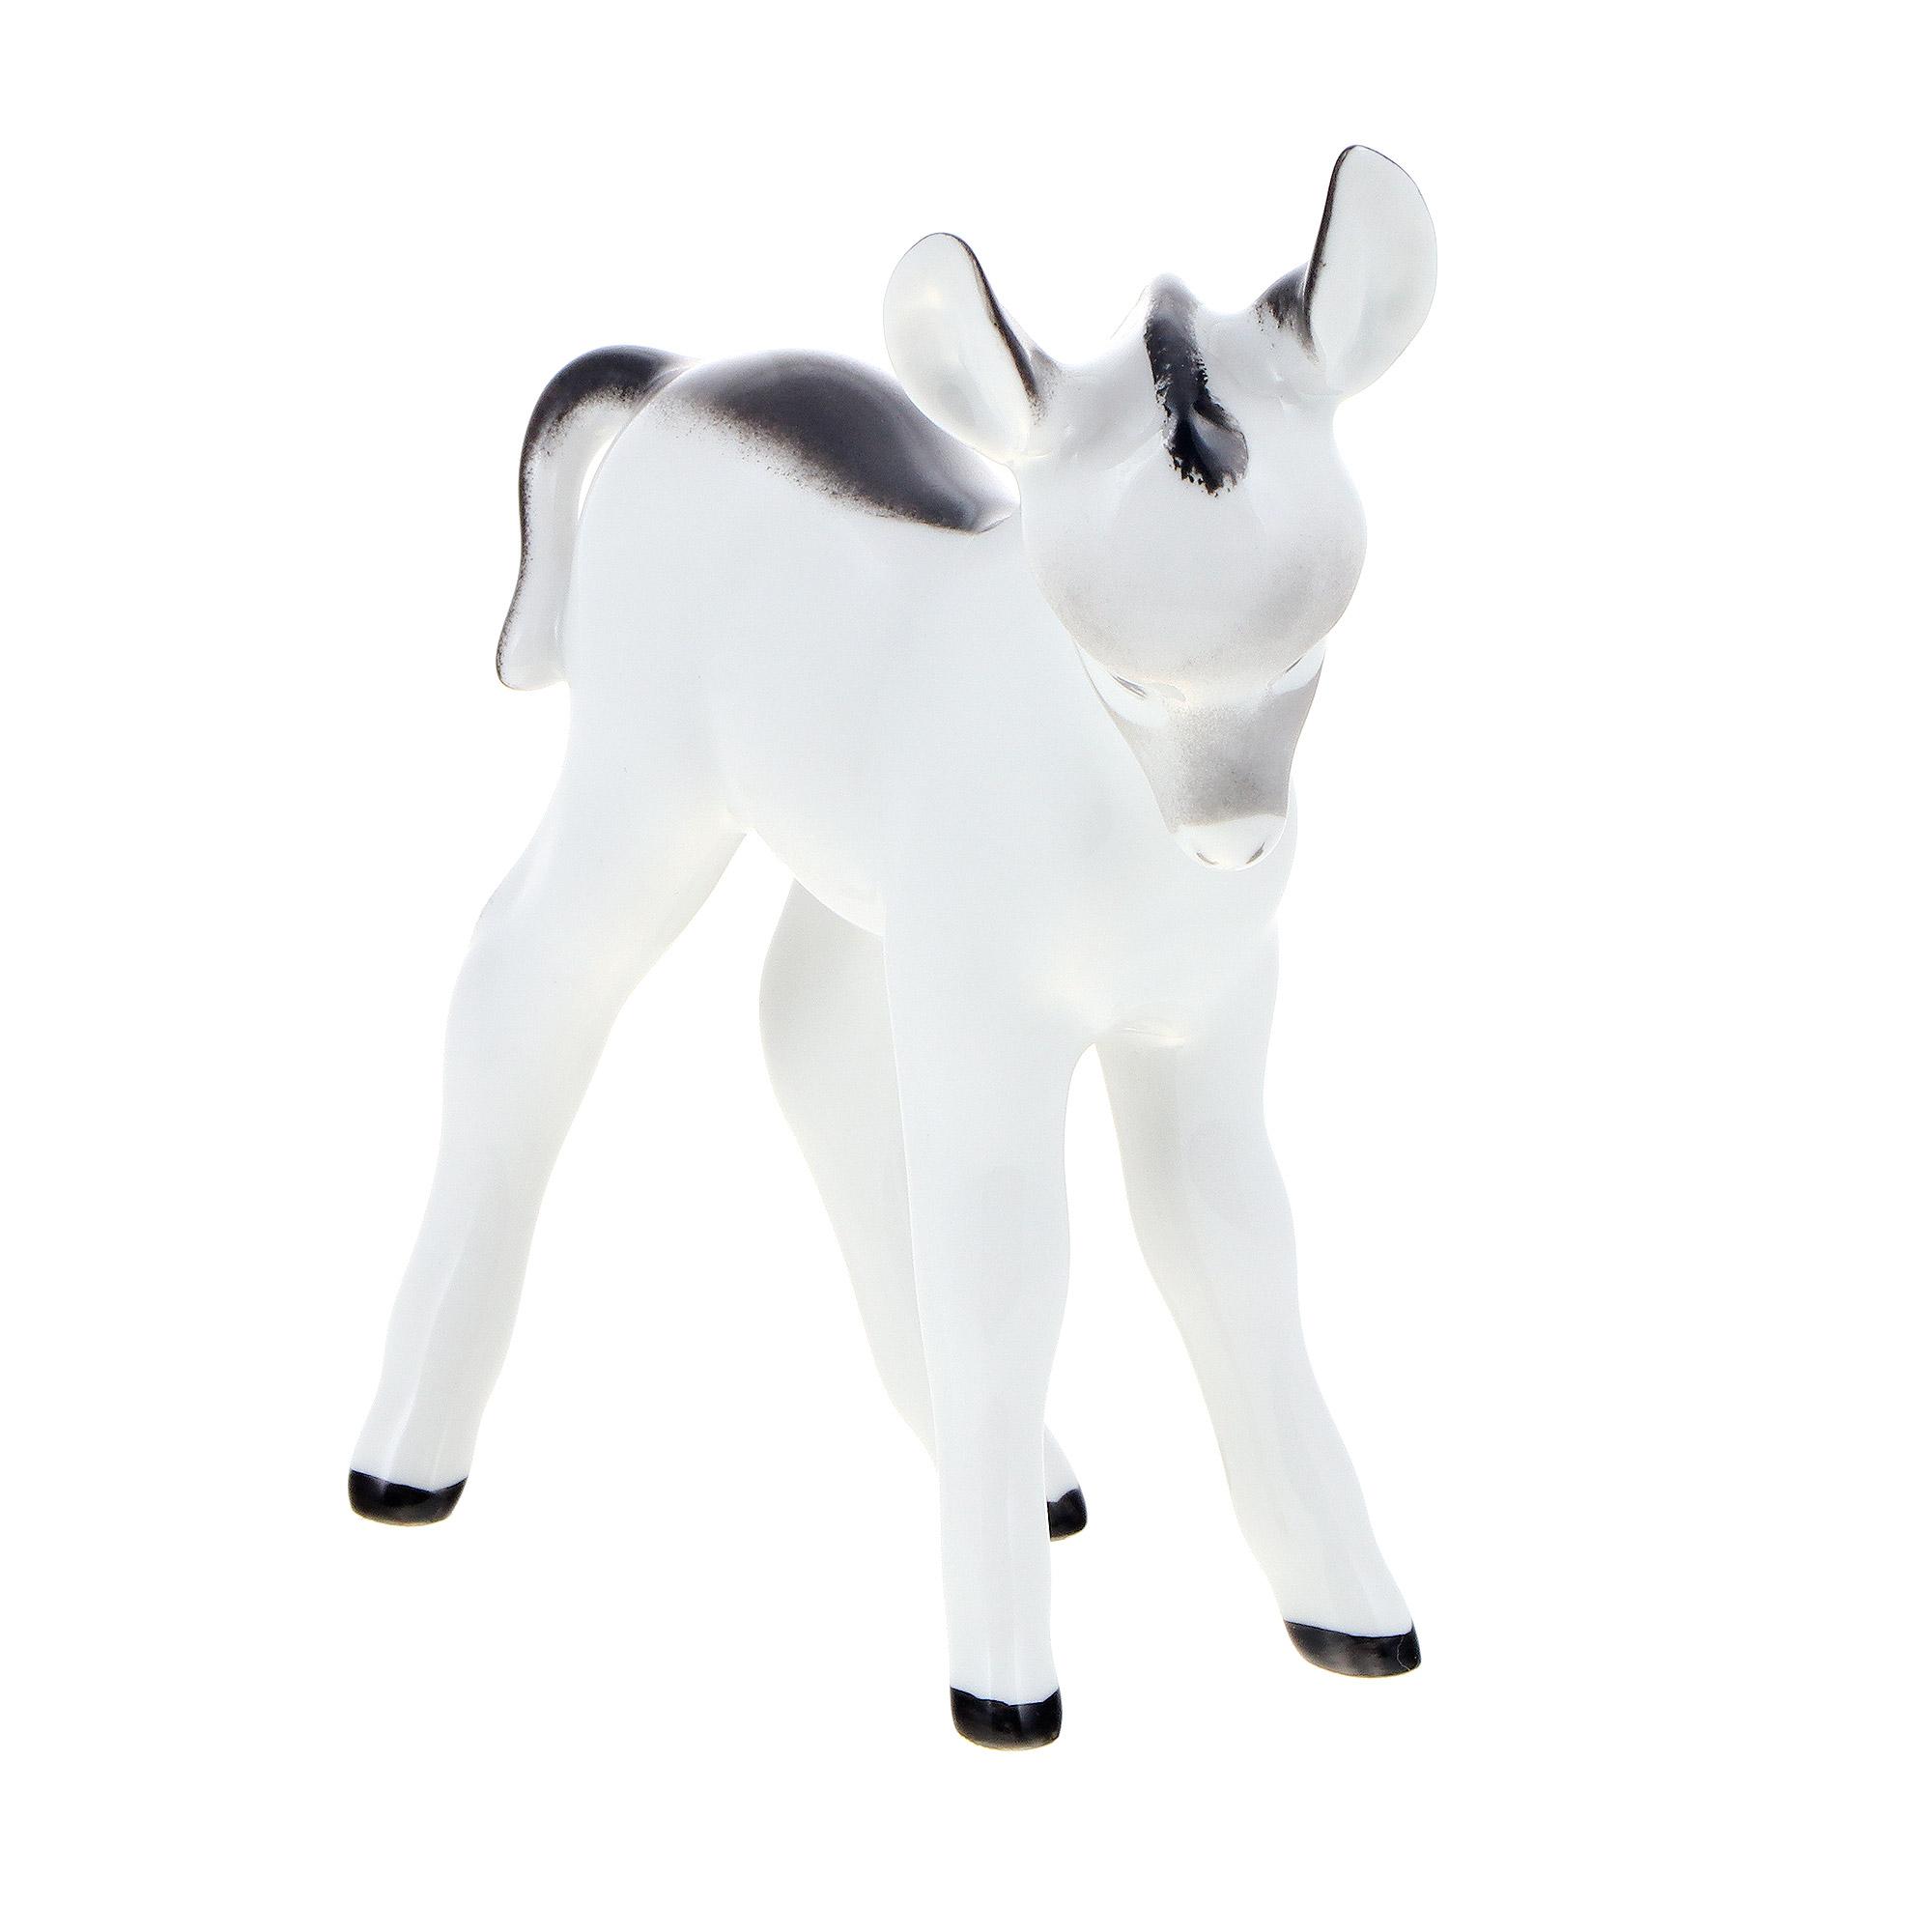 Скульптура Лфз - ослик скульптура лфз борзая